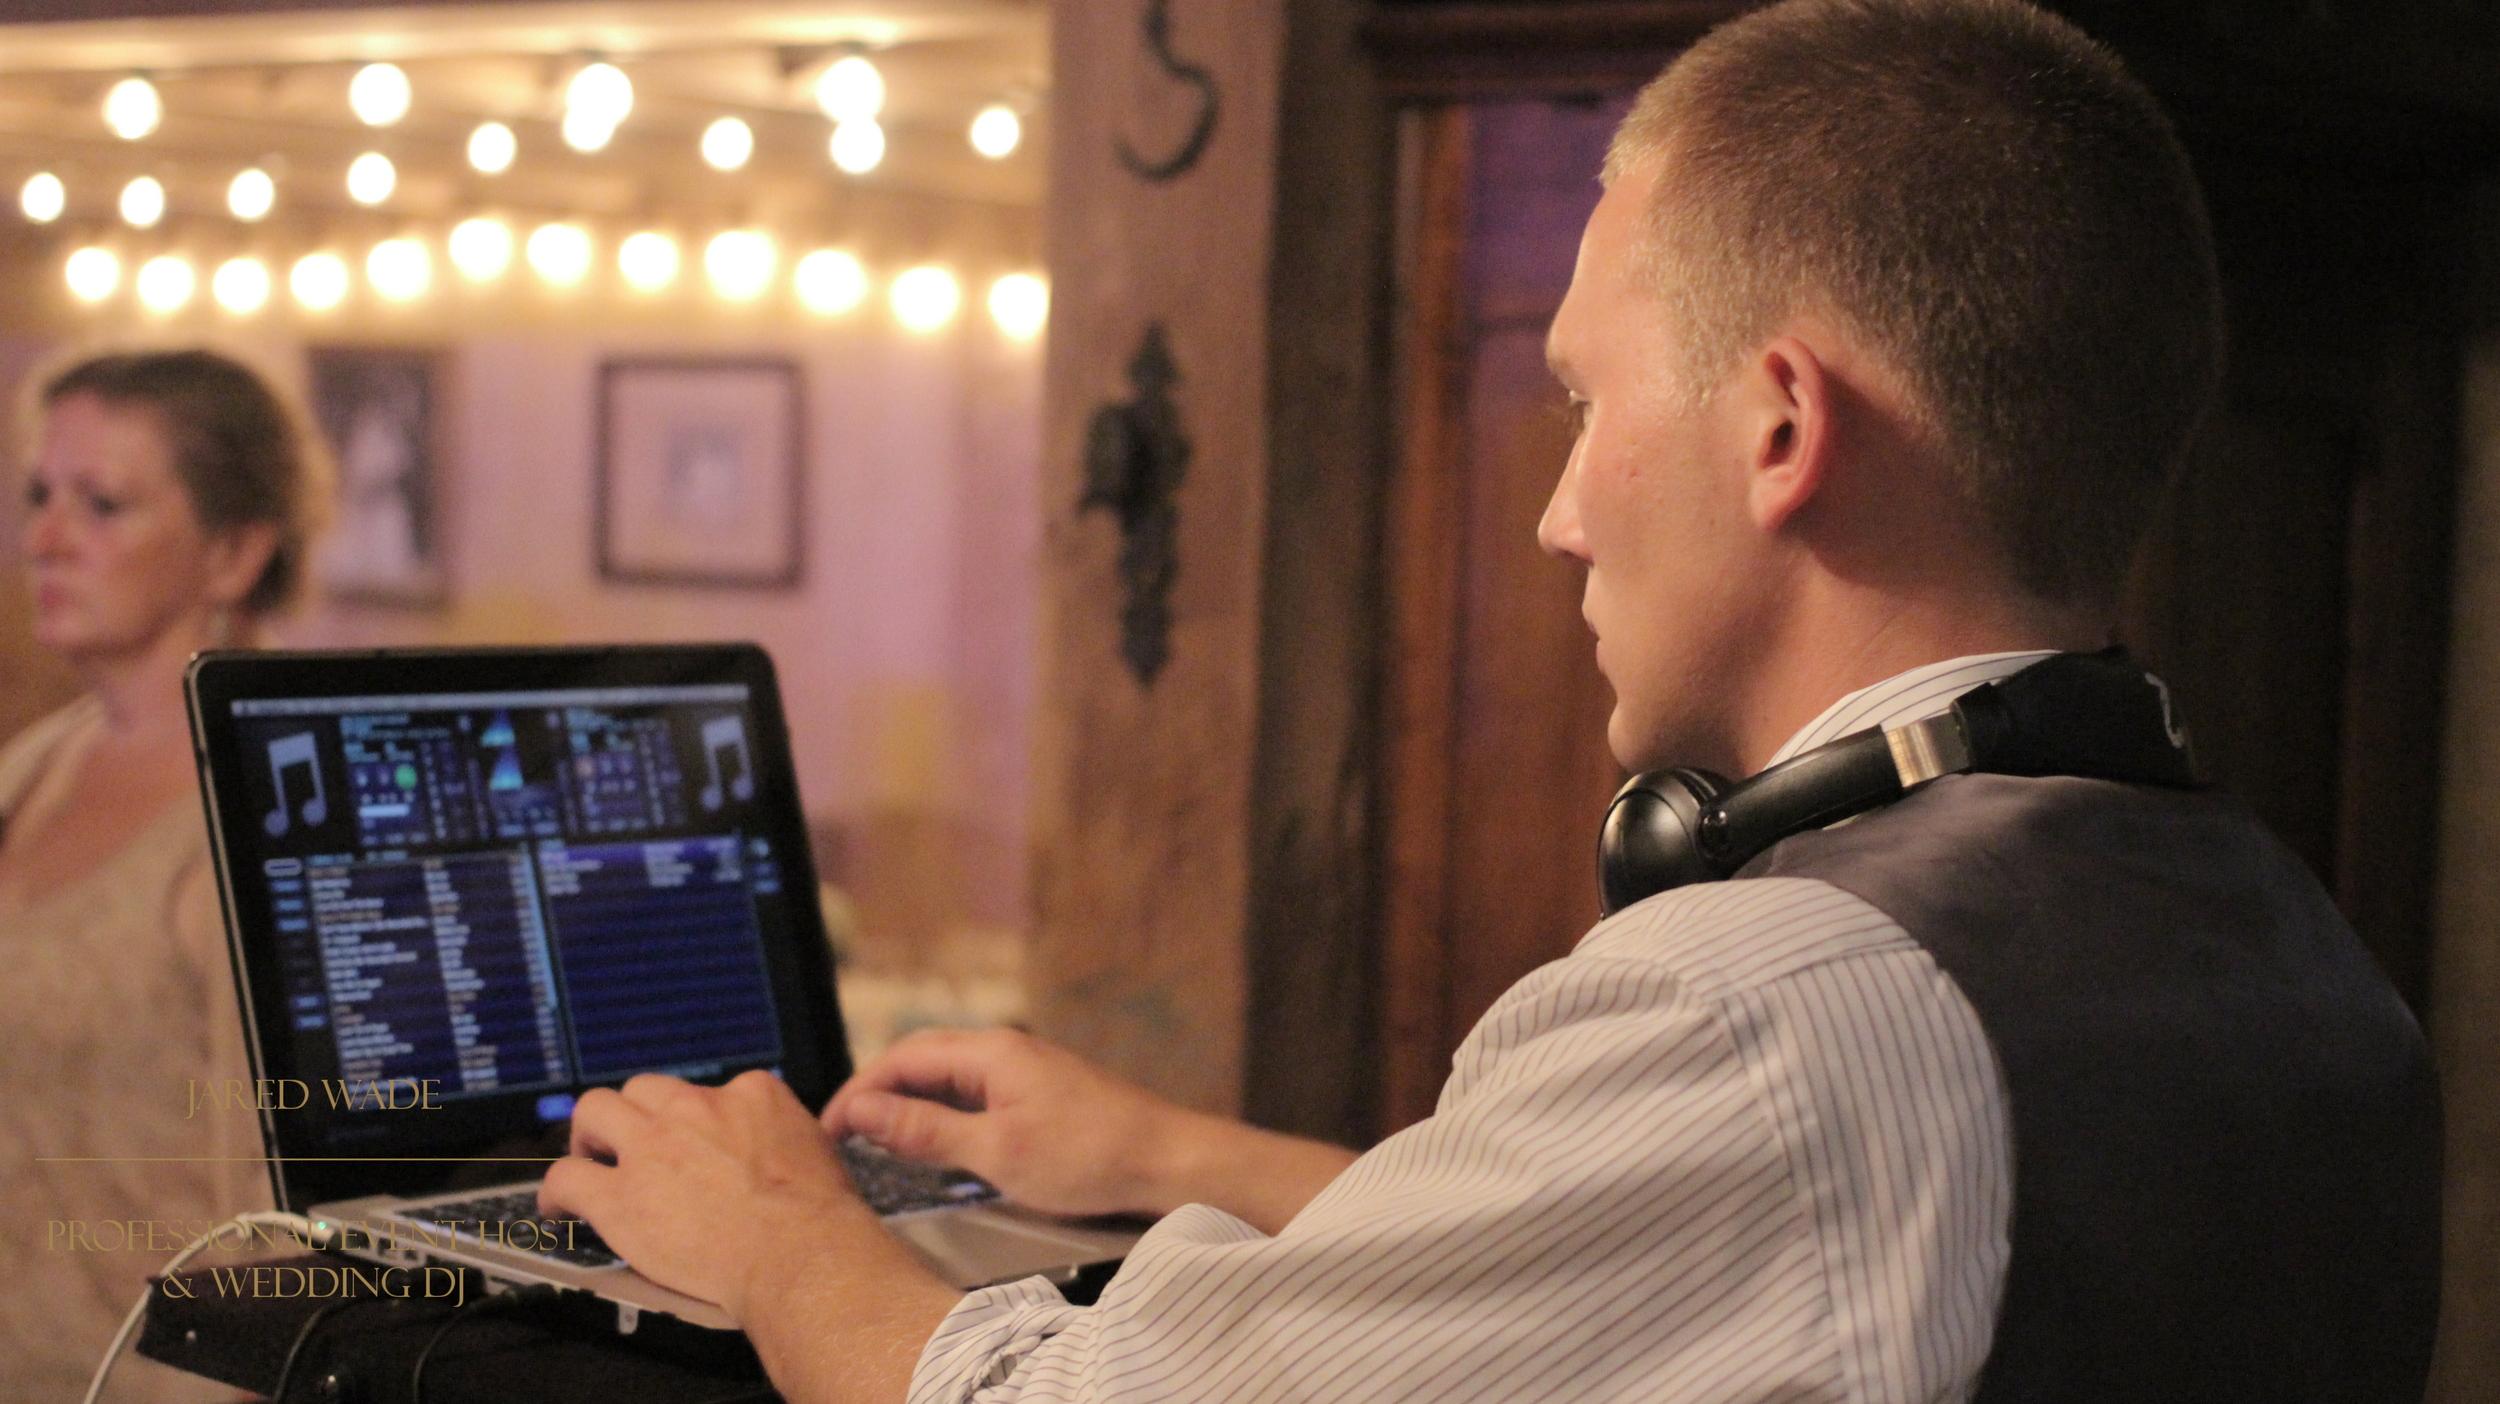 Jared Wade Professional Event Host   Indianapolis Wedding DJ   Morgan Acres Venue   Barn Wedding   Big Dance   Indianapolis Indiana